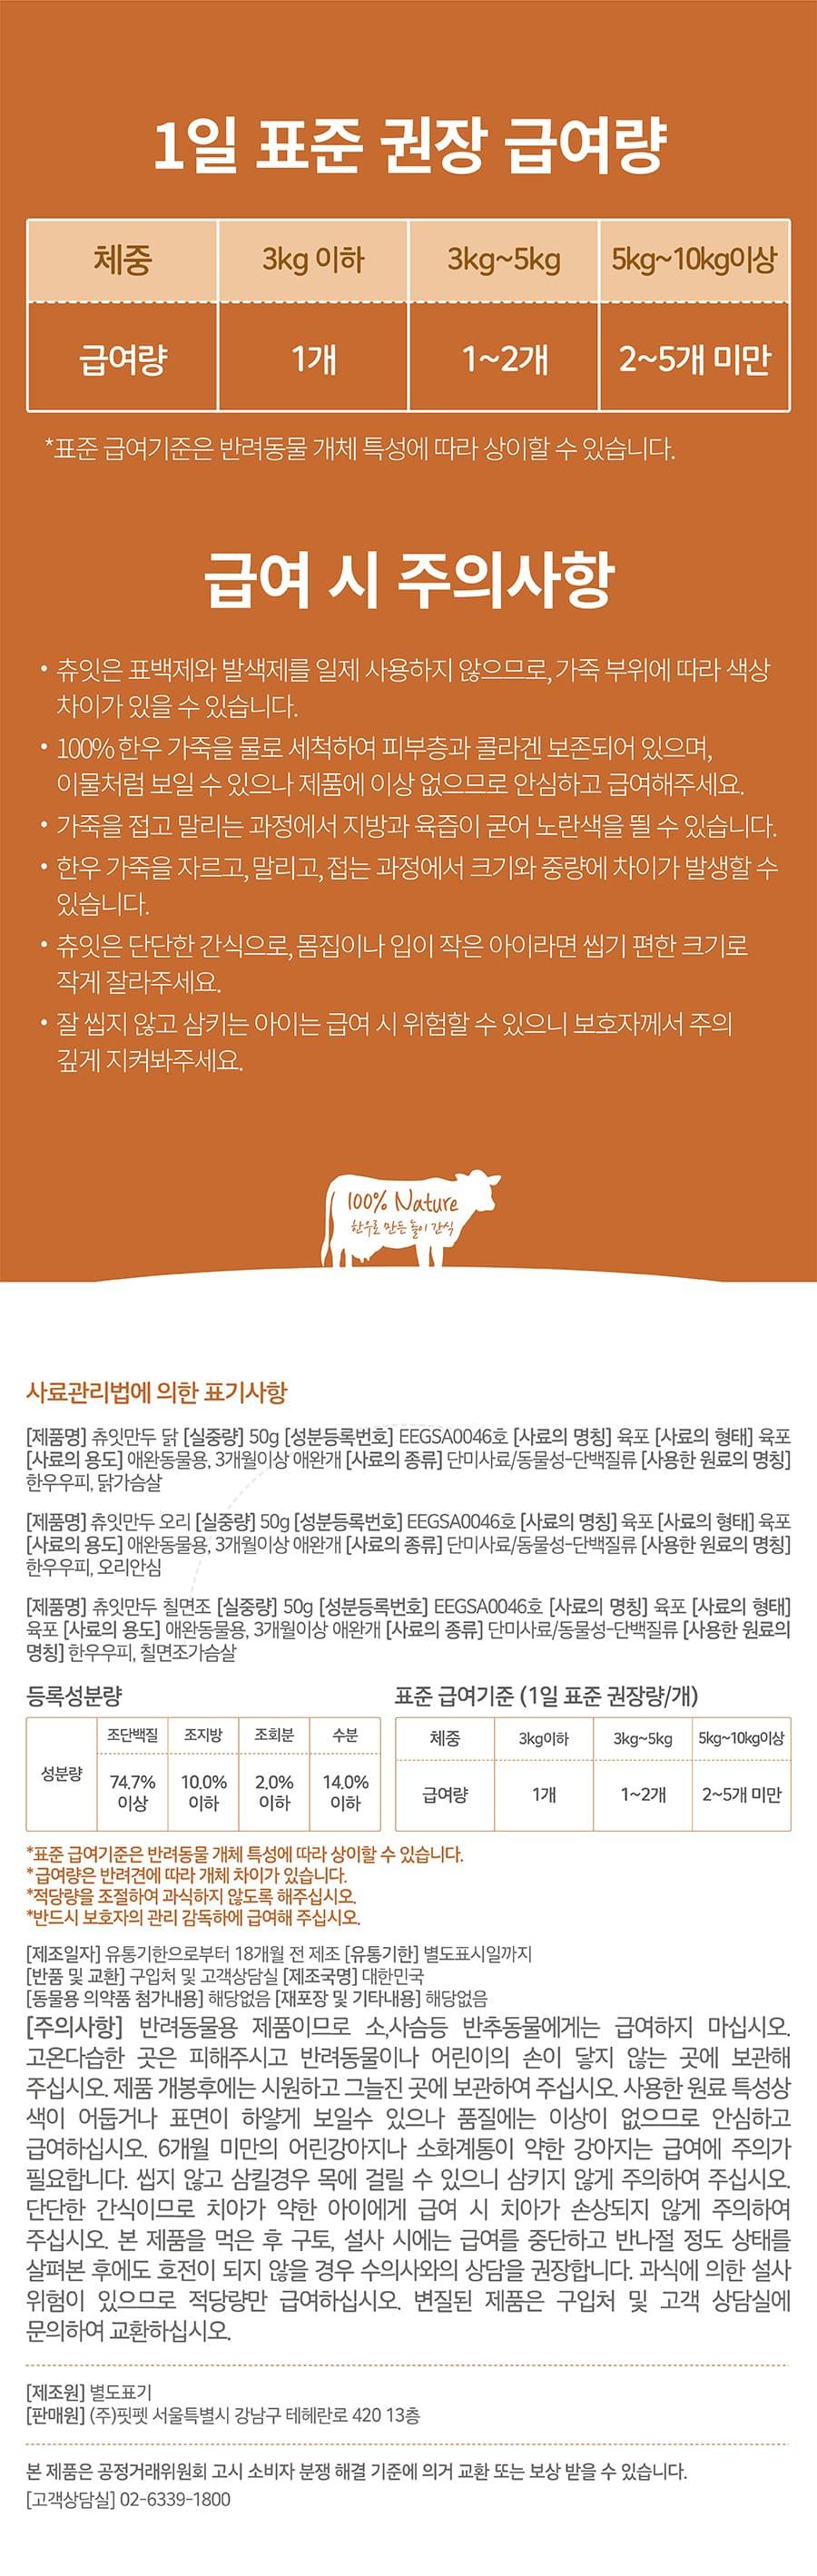 it 츄잇 만두 (닭/오리/칠면조)-상품이미지-33